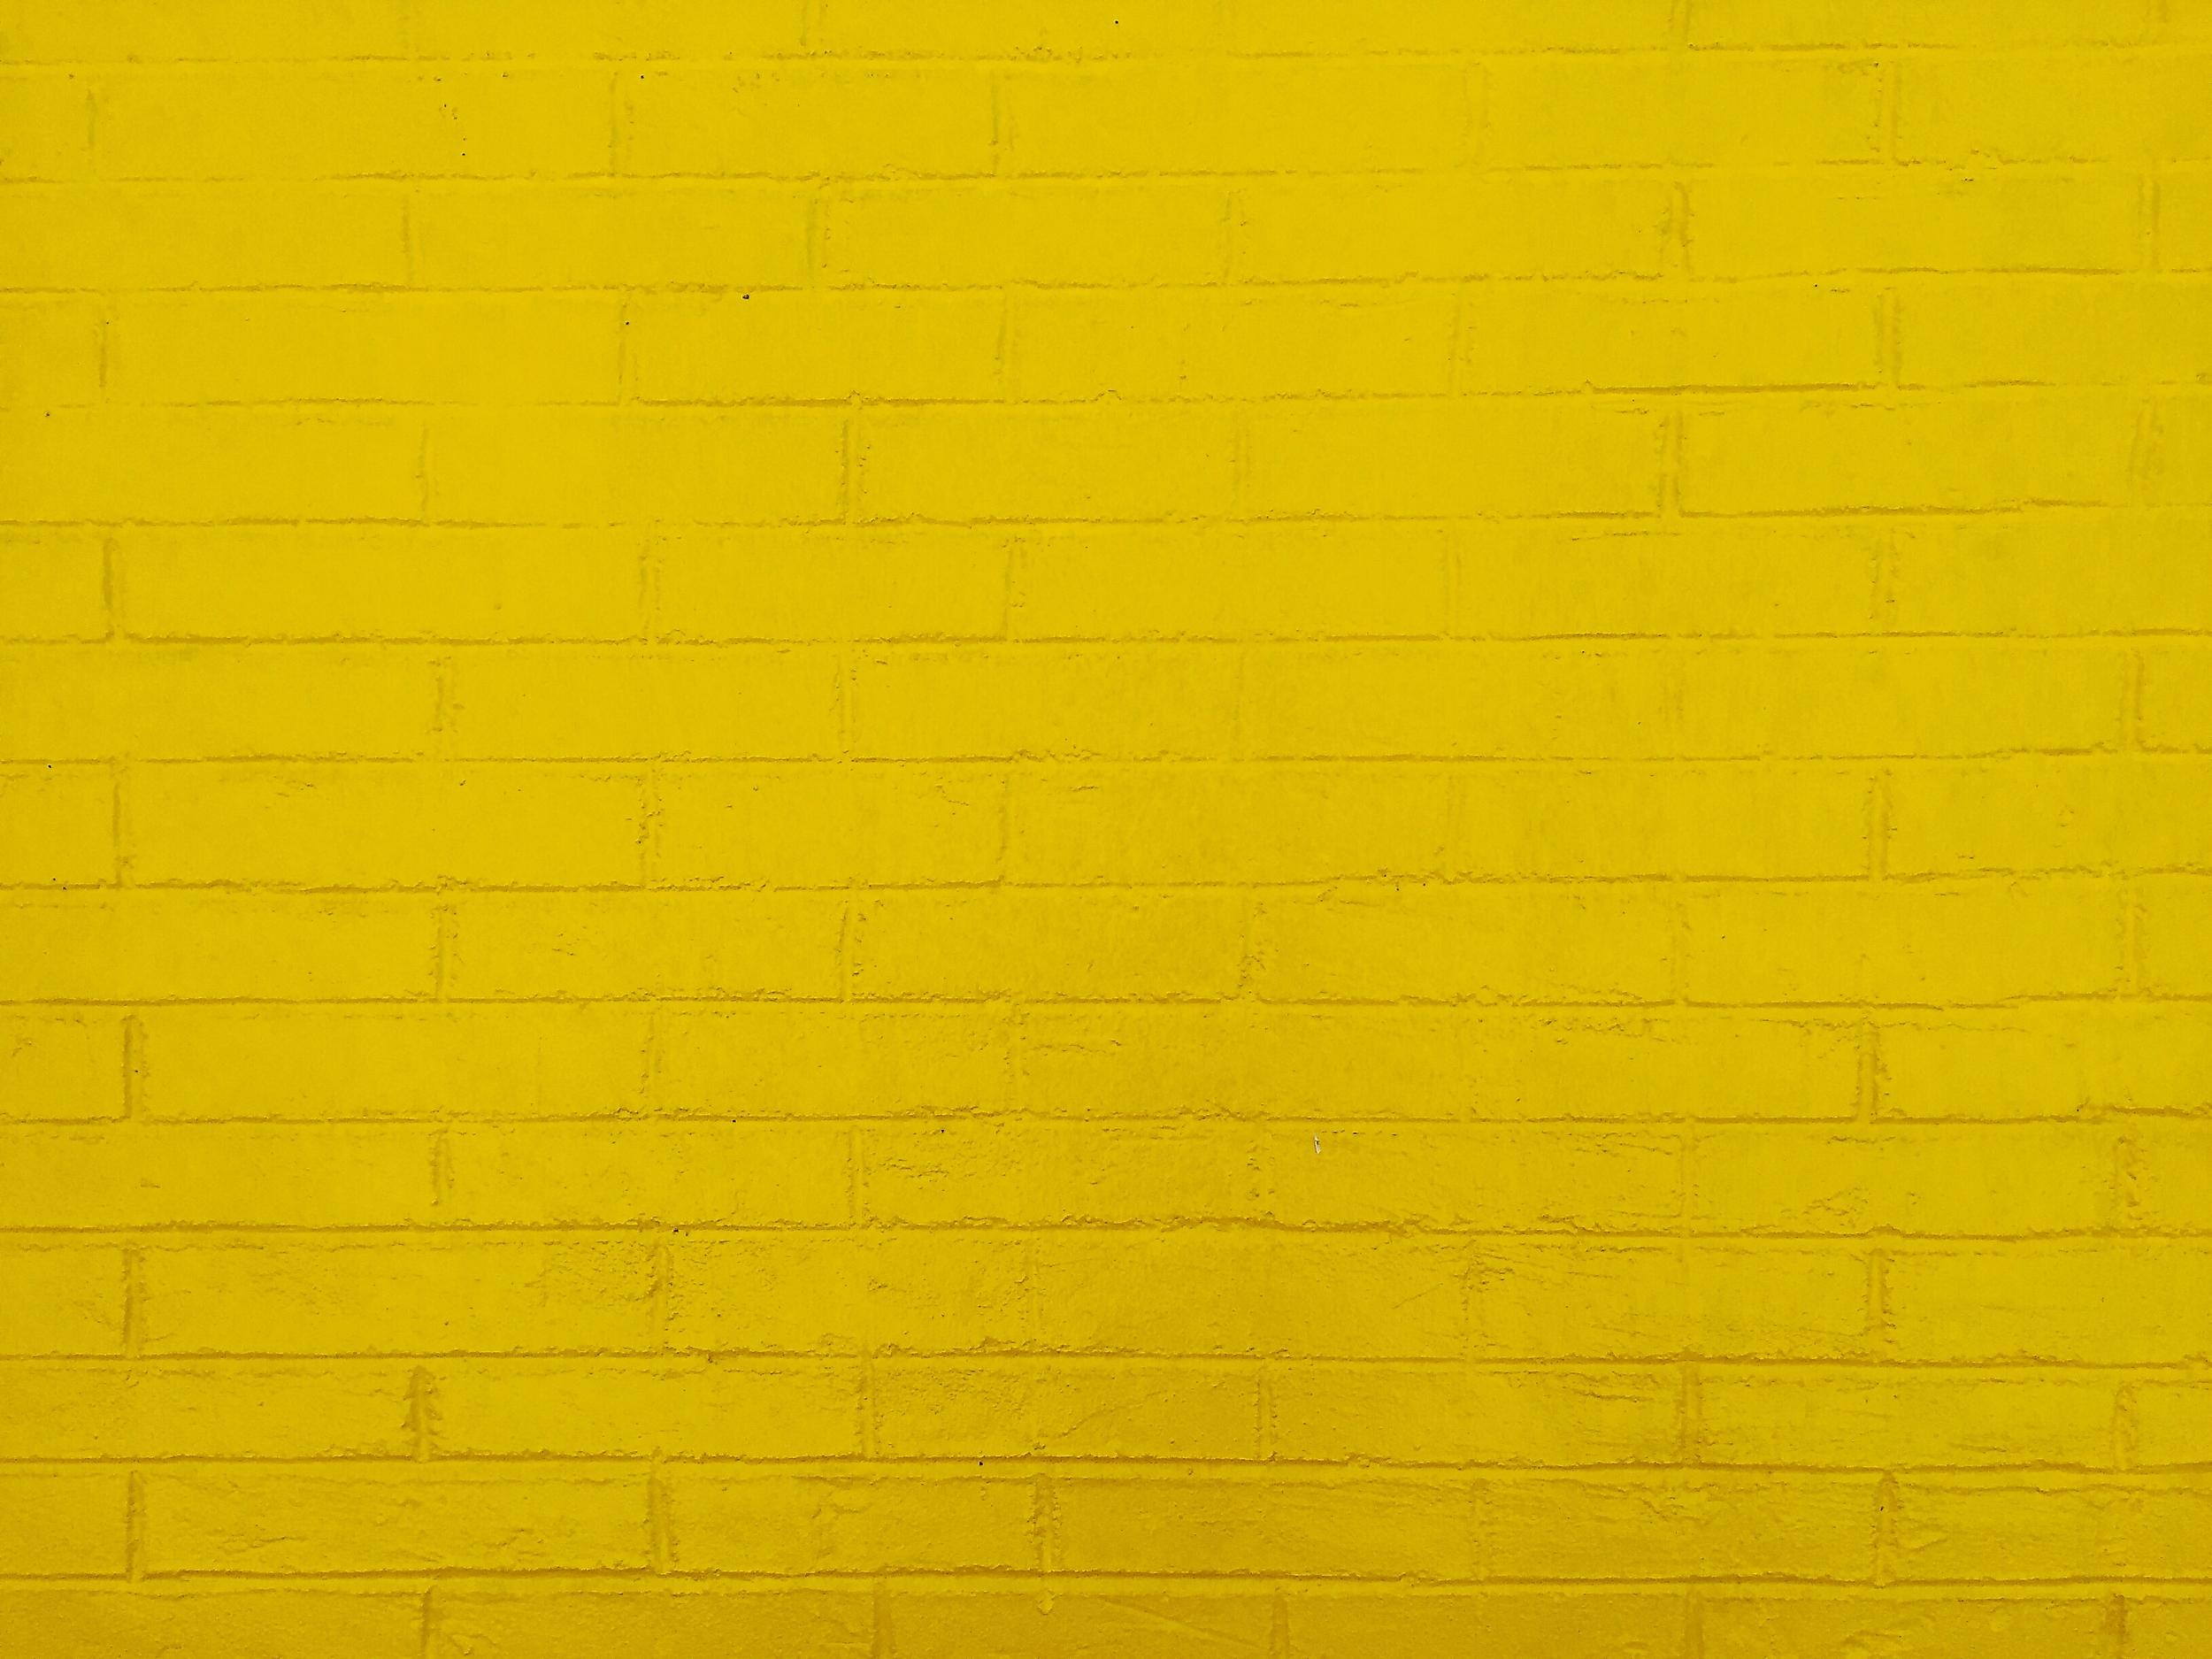 melt-ice-creams-yellow-wall-walls-that-talk.jpg